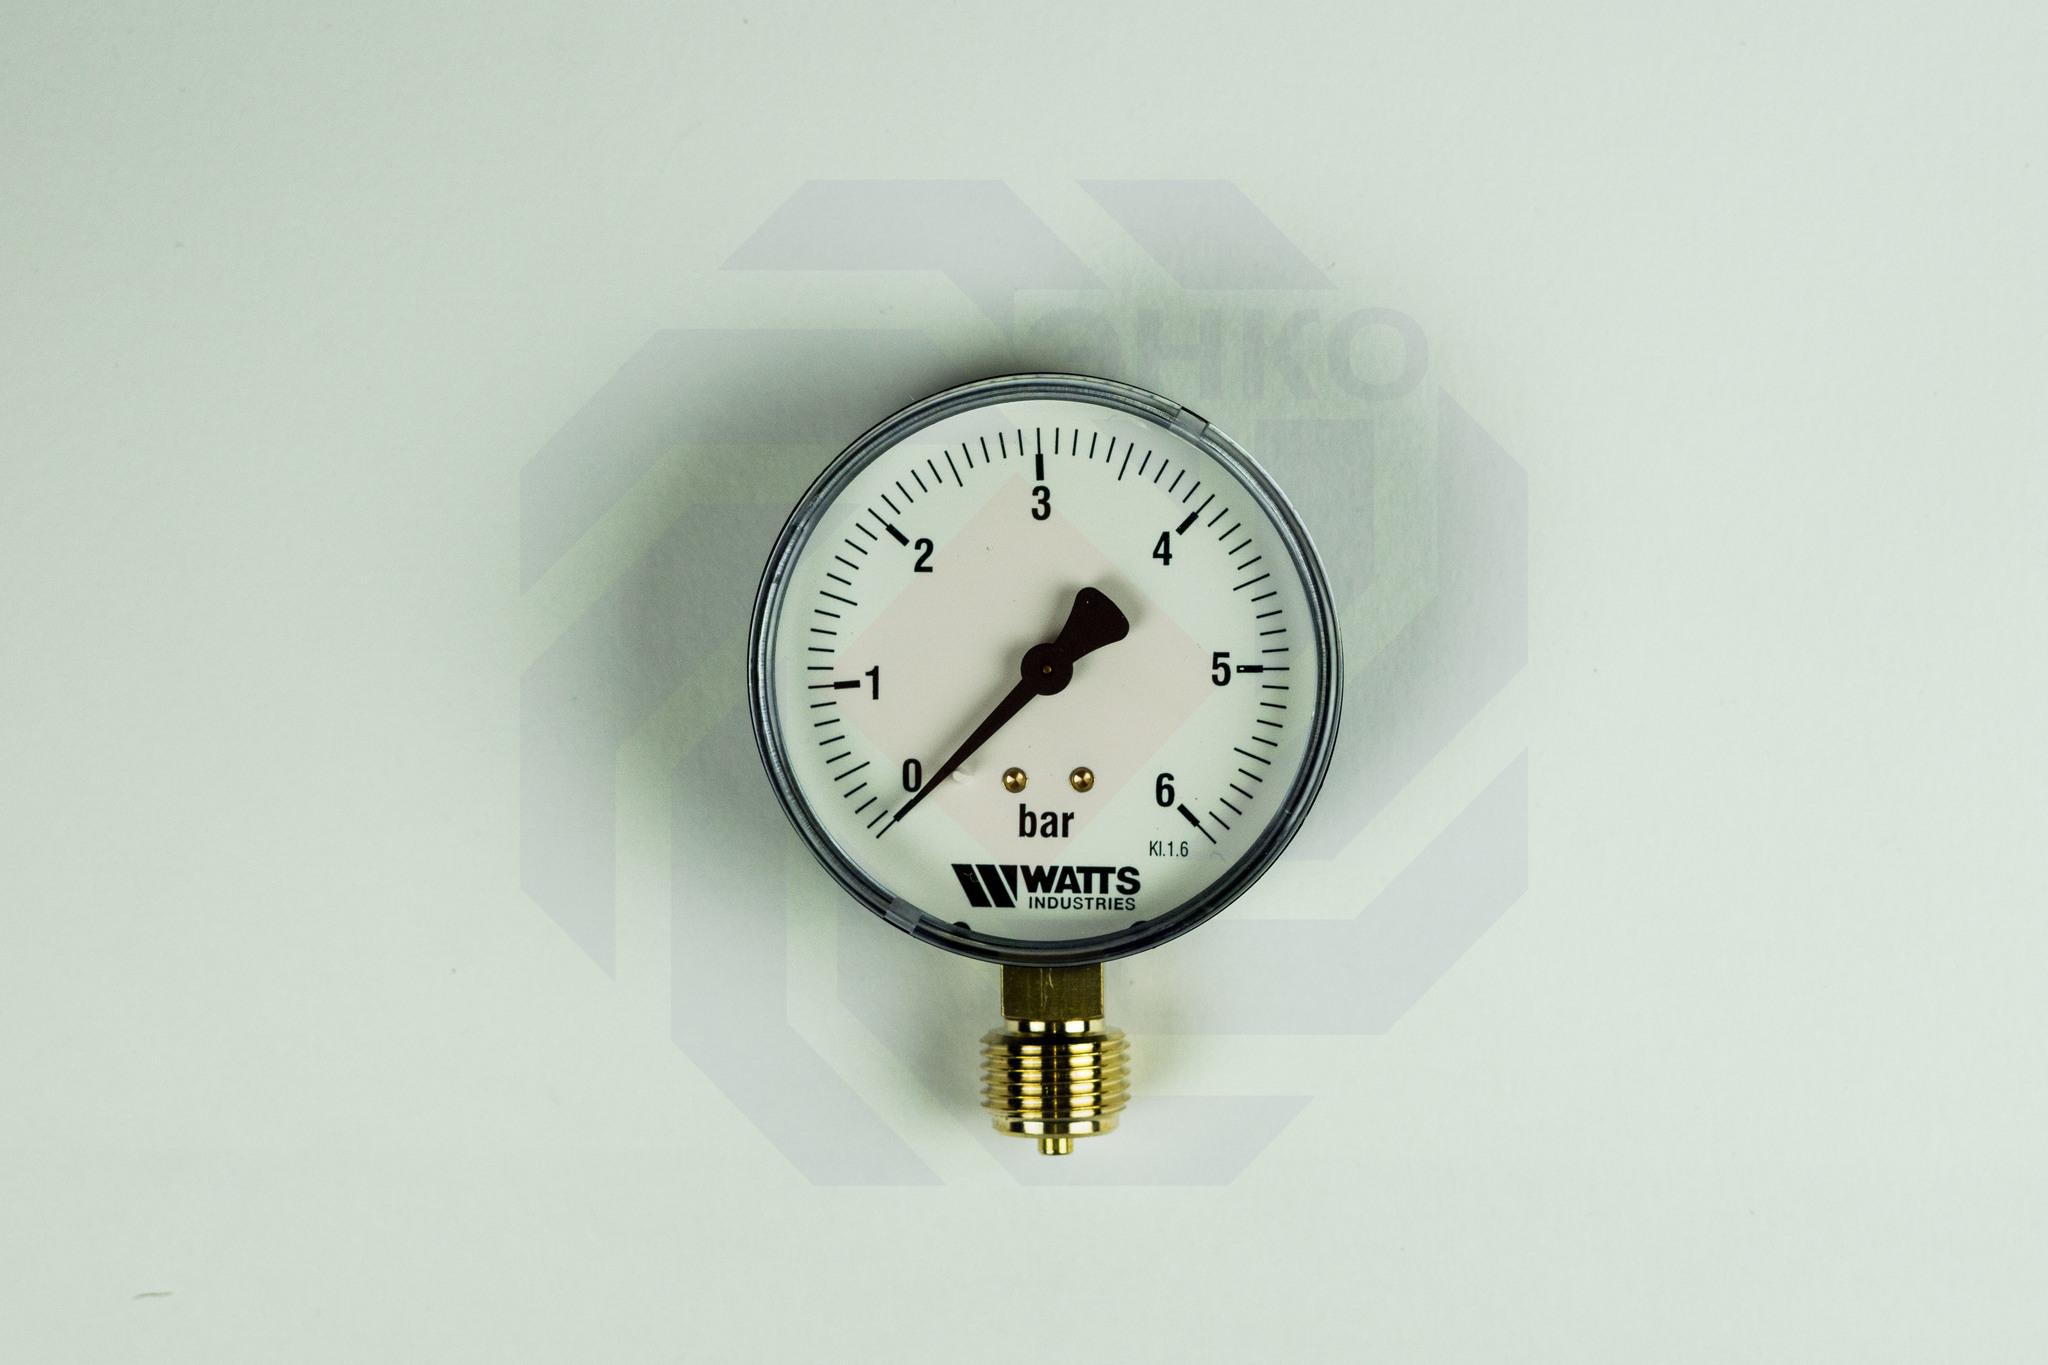 Манометр радиальный WATTS MDR 80/6 (F+R200) 0-6 бар 80 мм ½